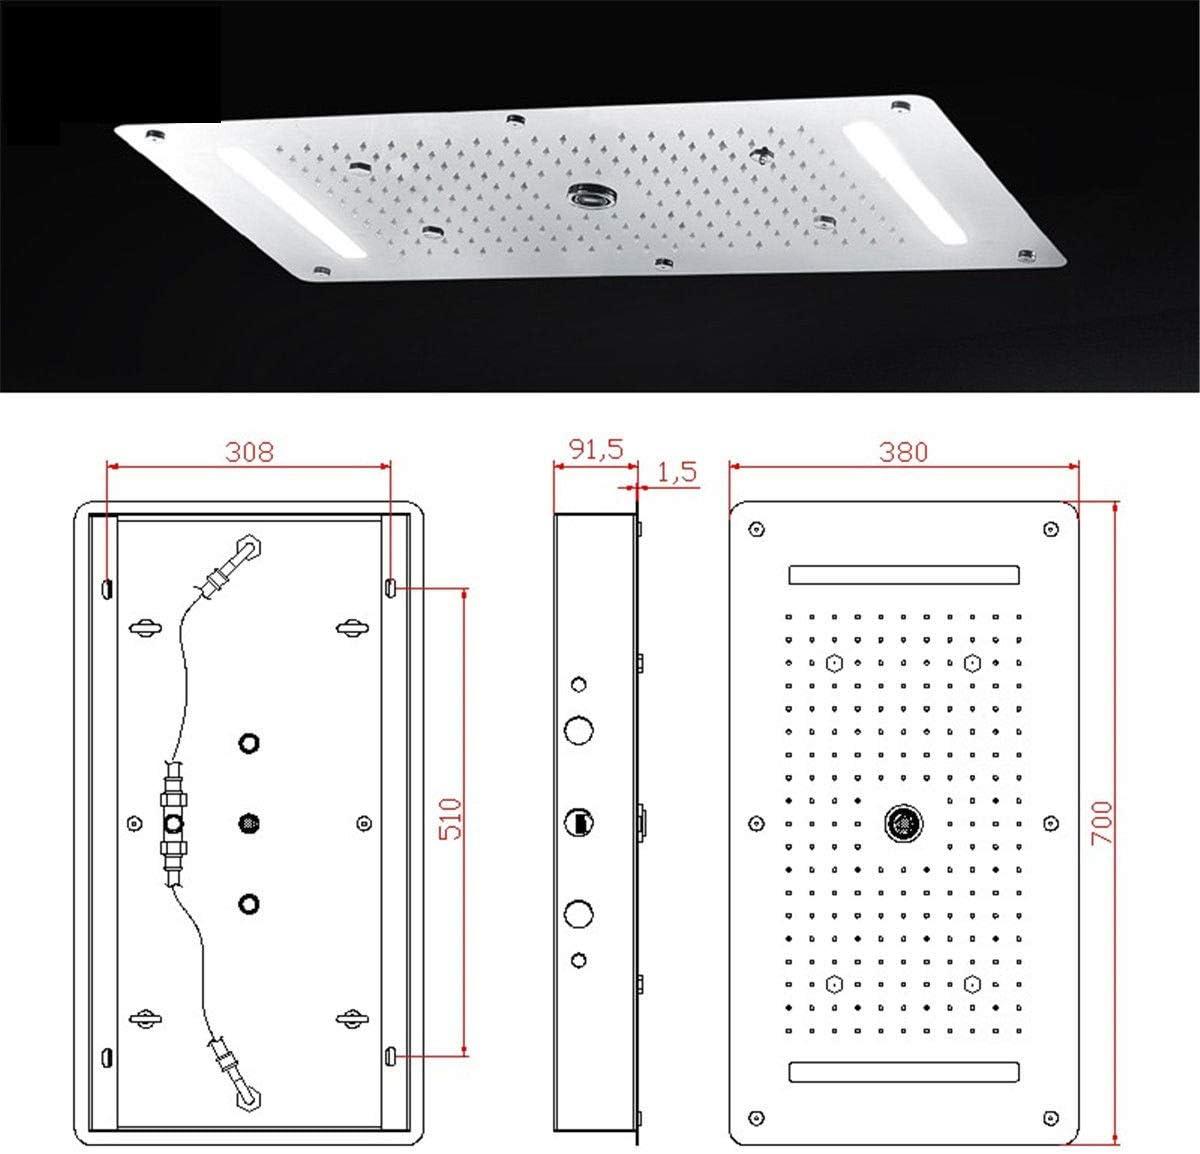 Duchas (cabezal de ducha)9función LED ducha luz lluvia ducha ...